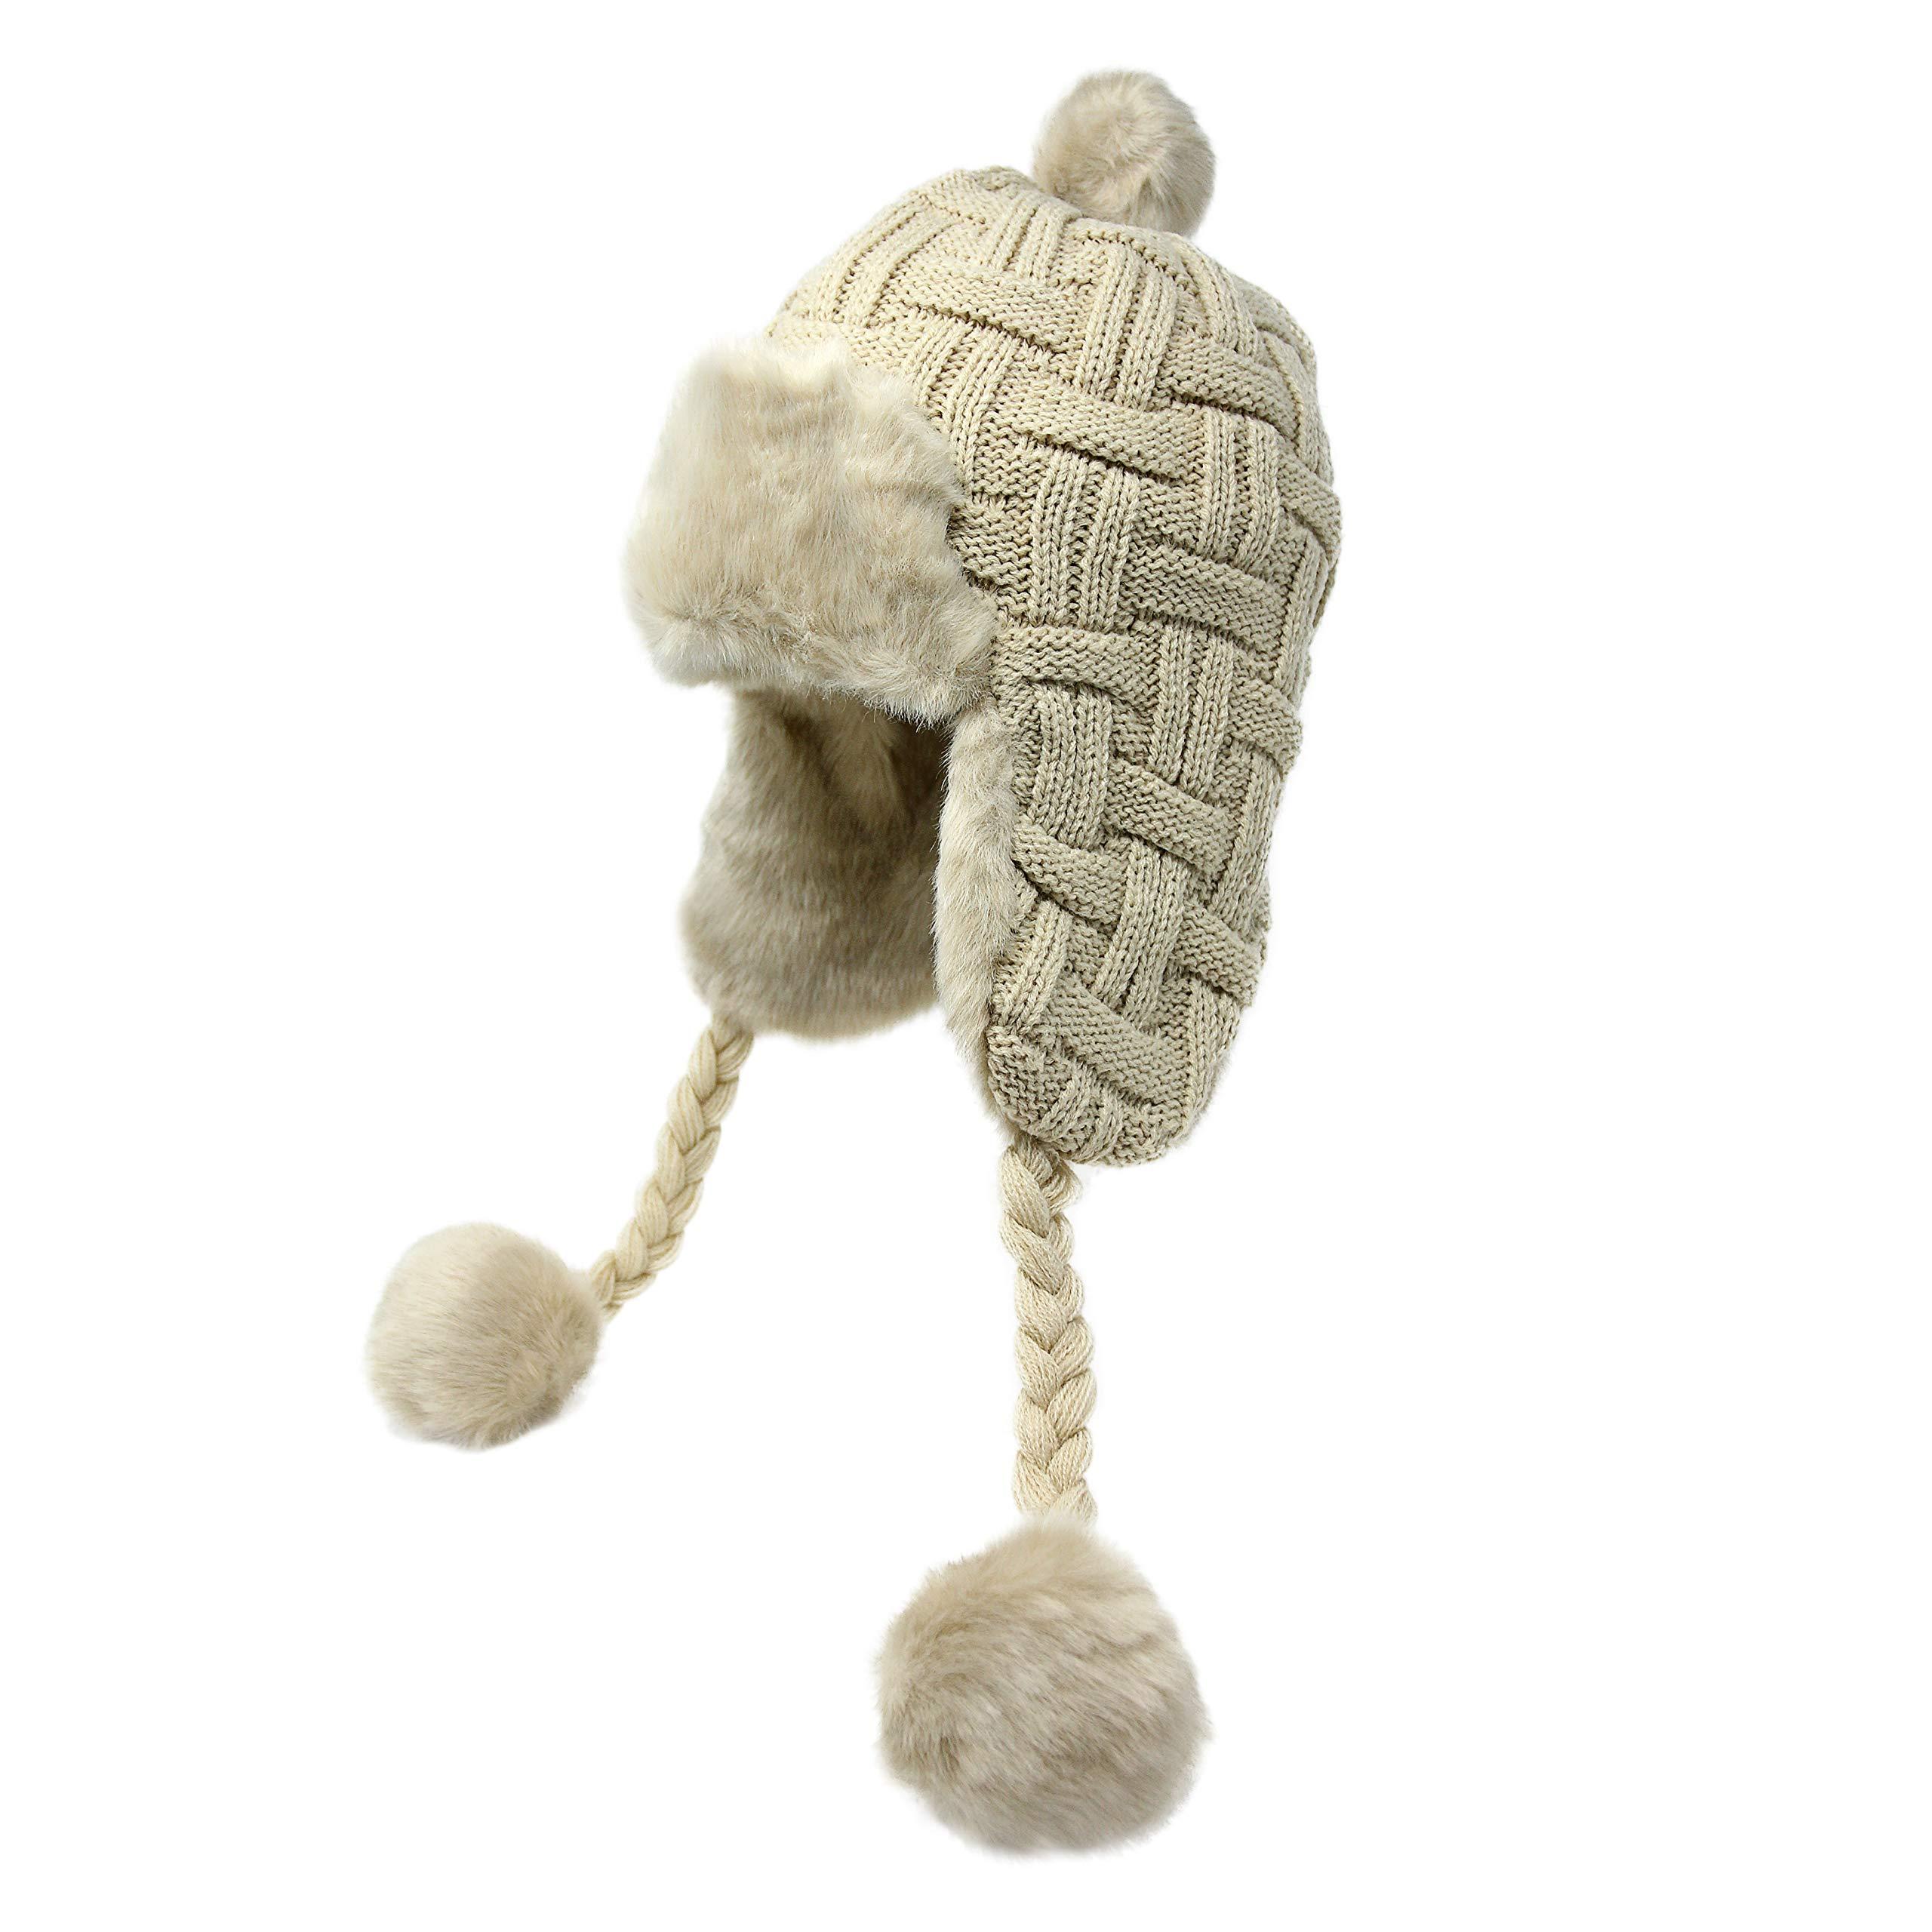 1809c9b07466b High Desert Gear Women s Knit Peruvian Beanie Hat Winter Warm Fuzzy Cap  with Earflap Pom Pom Ski (Beige)